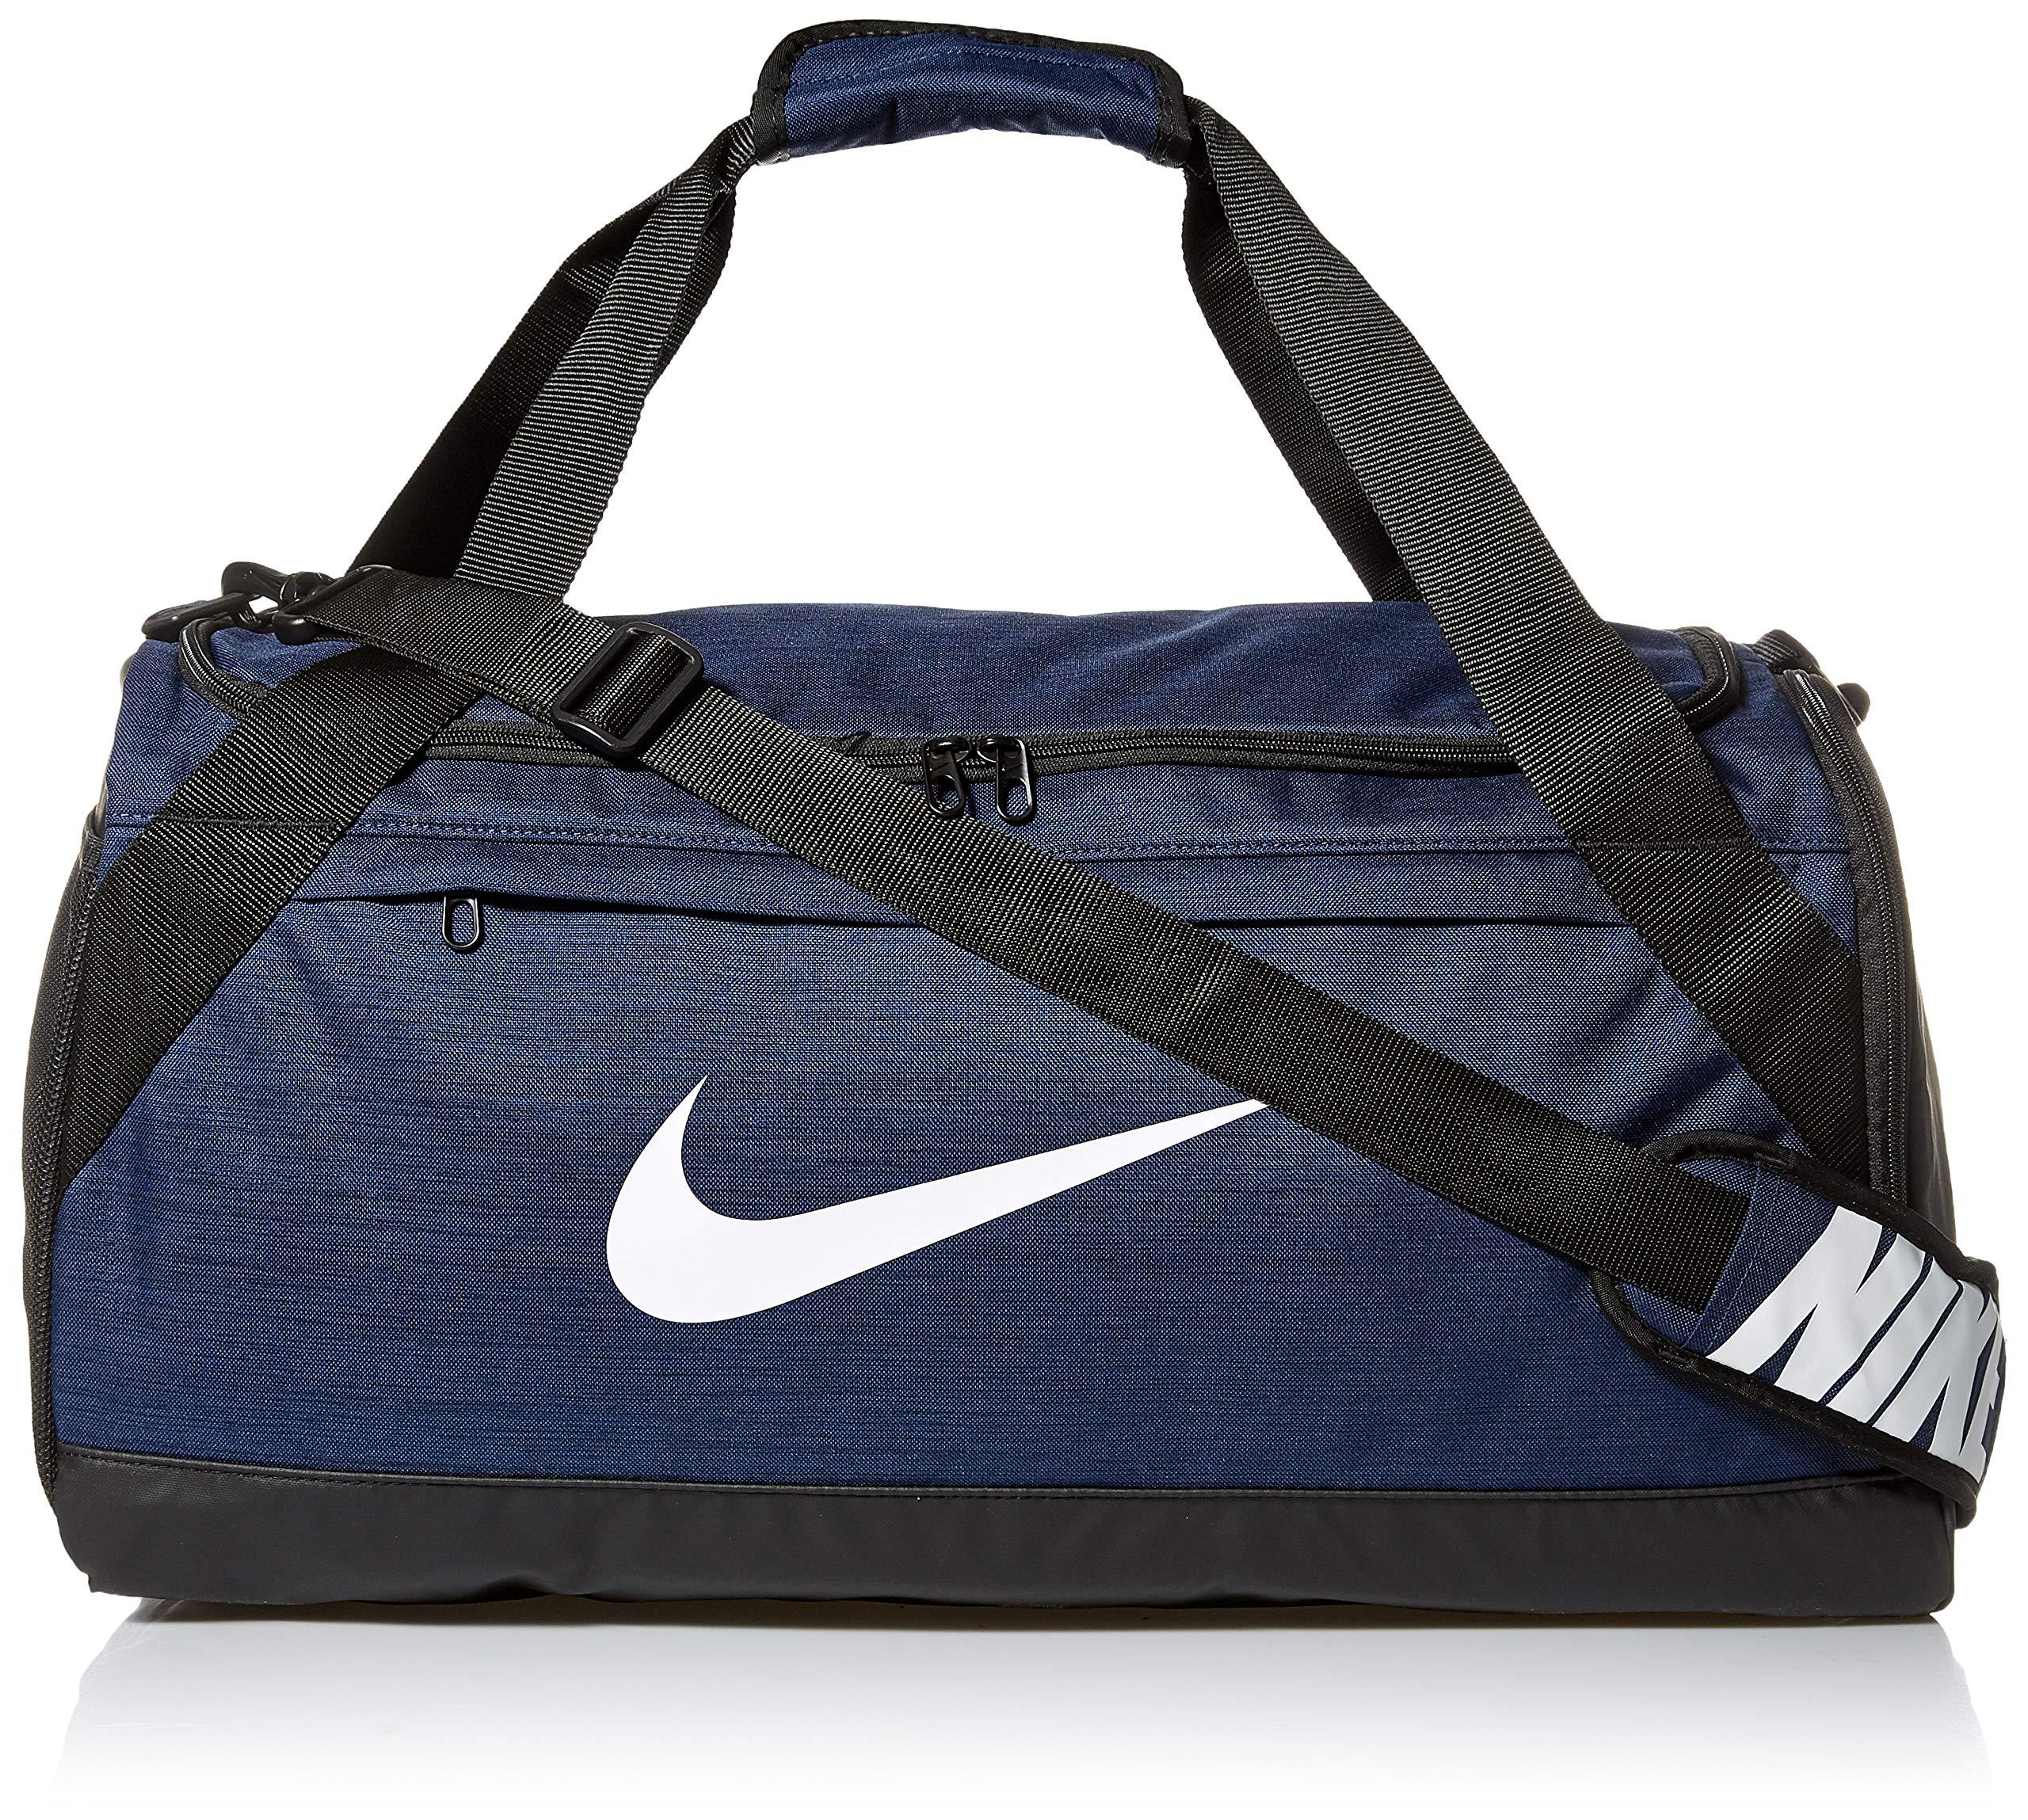 Nike Brasilia Medium Duffle, Midnight Navy/Black/White, Misc